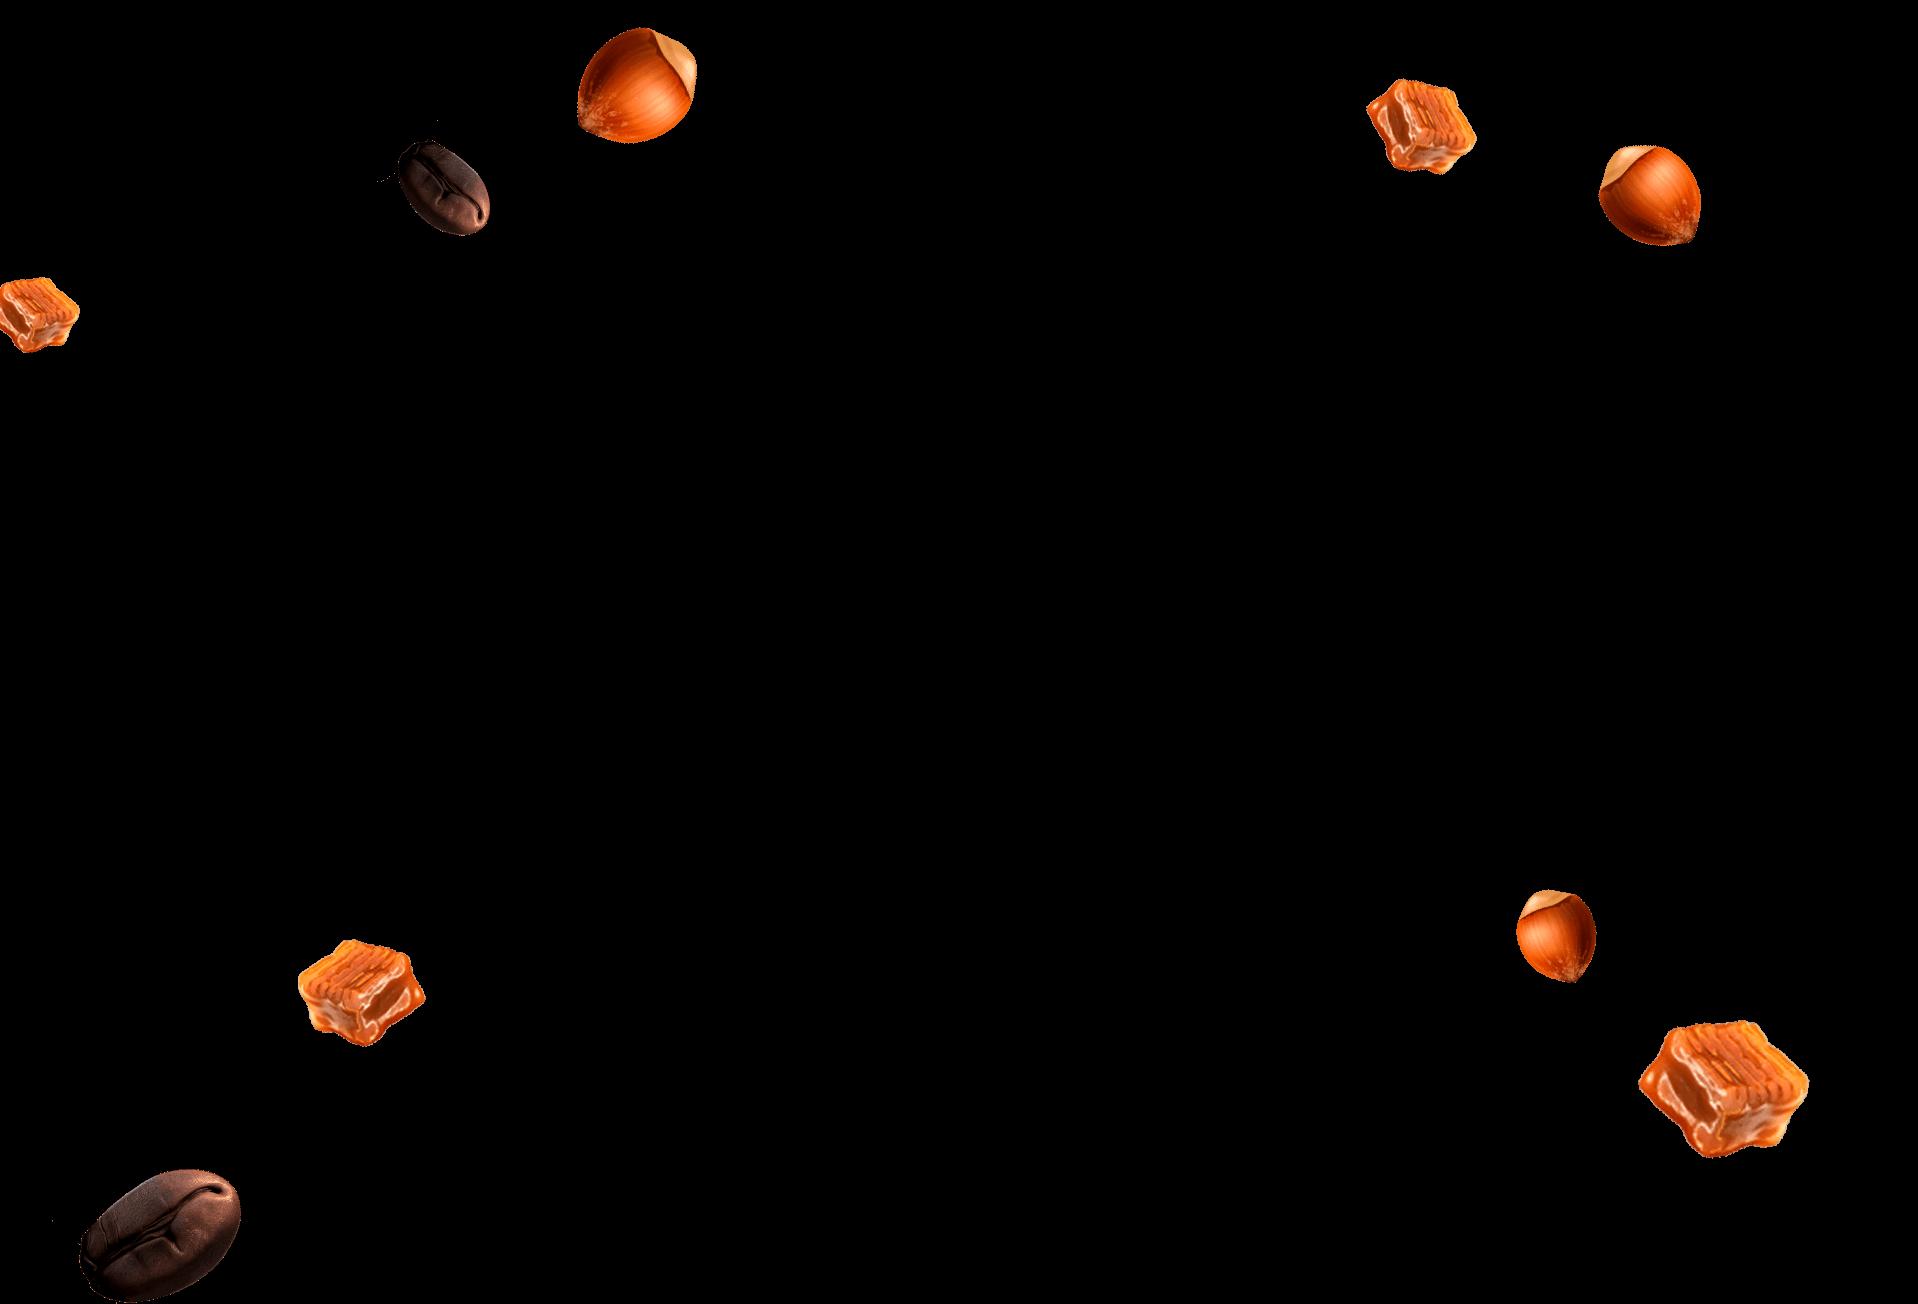 Prize elements